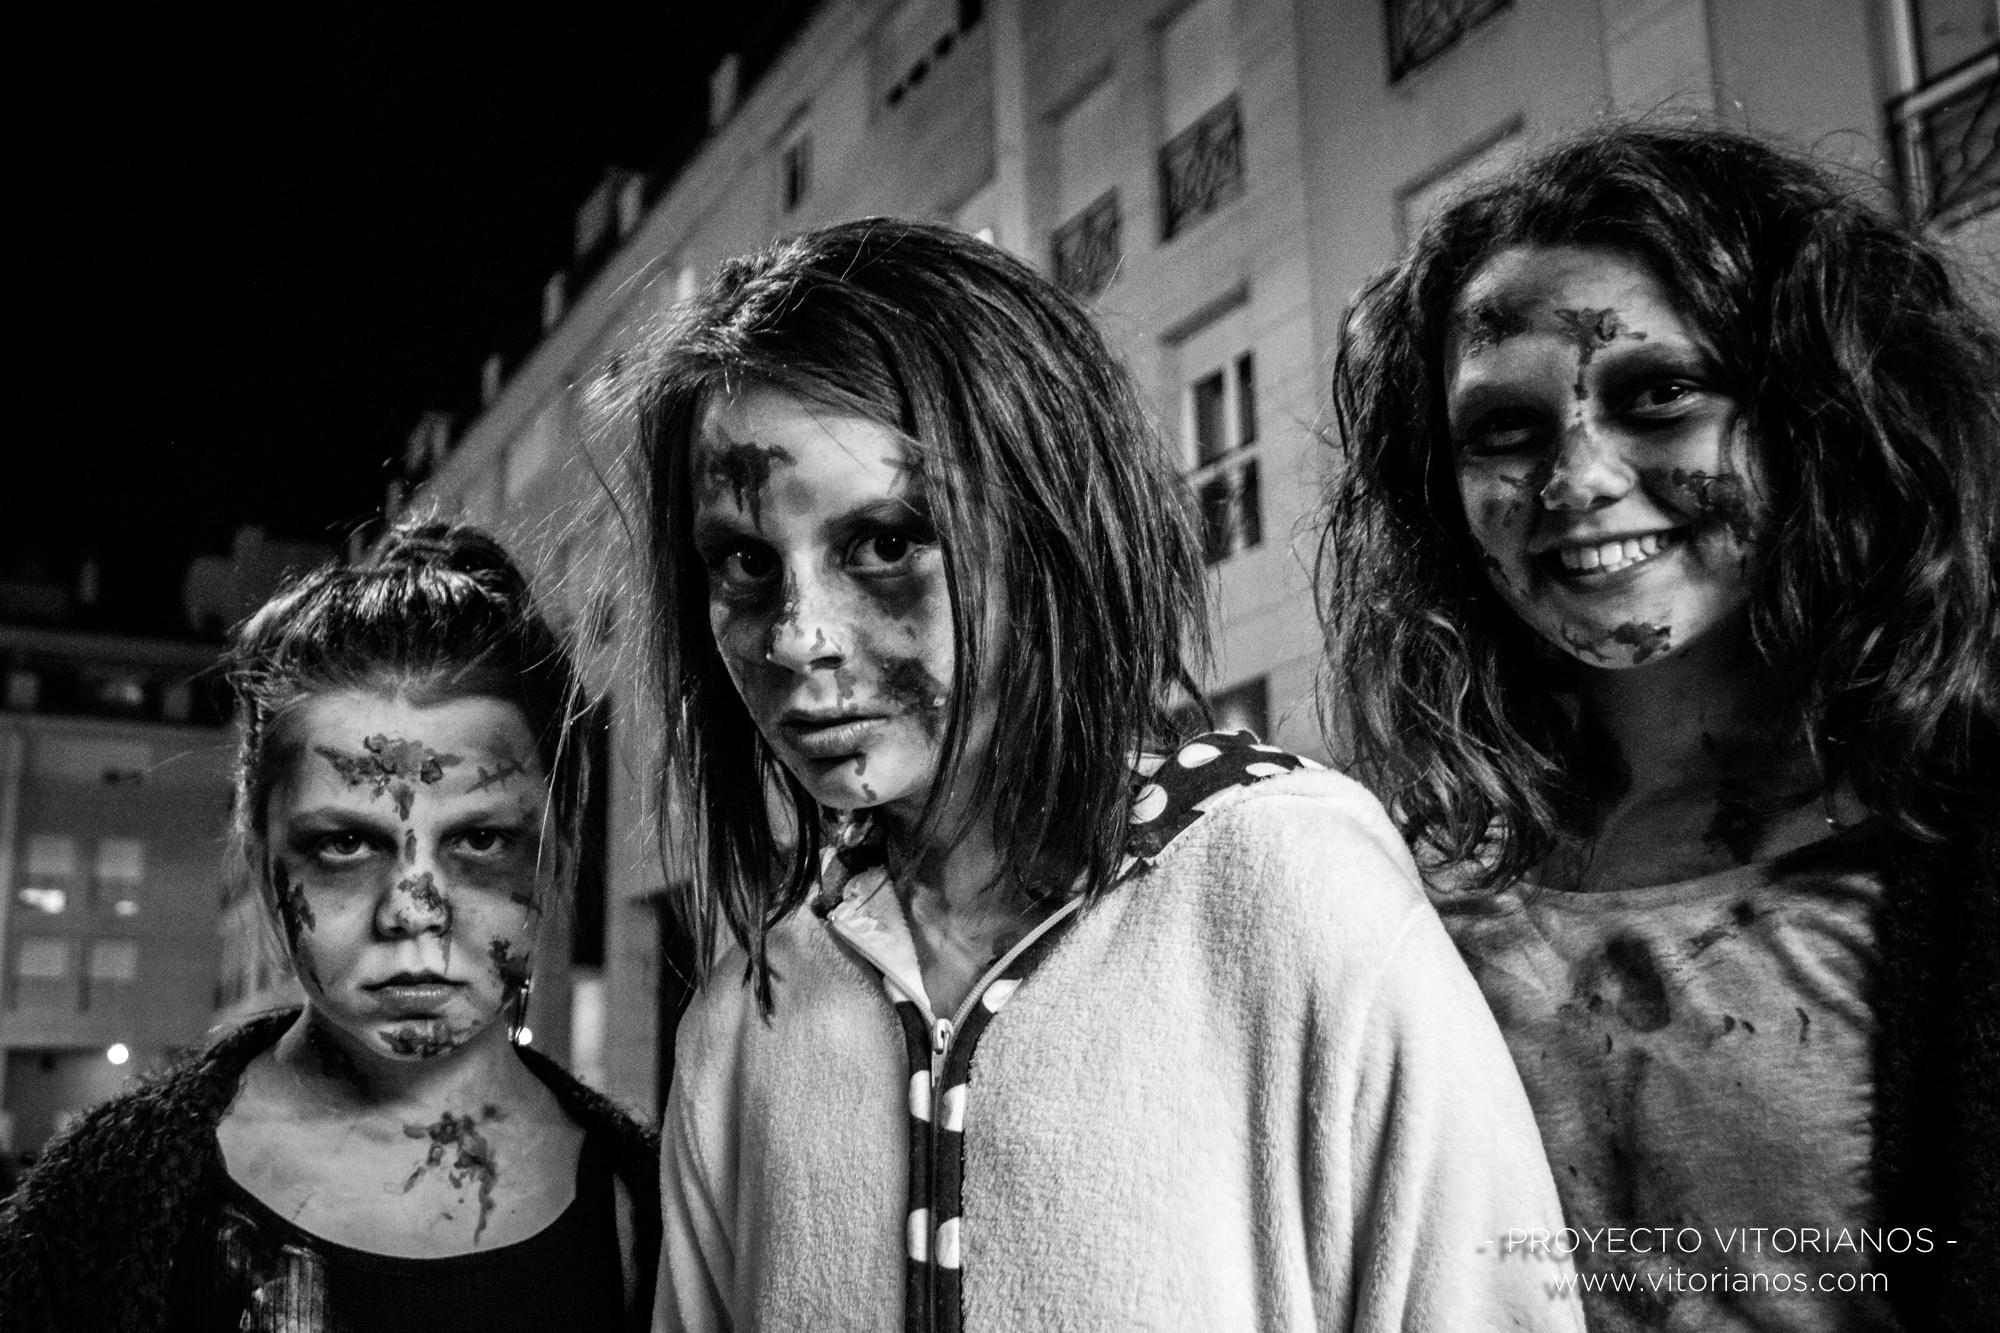 Vitorianas en Halloween - Foto: Raúl Cerezo